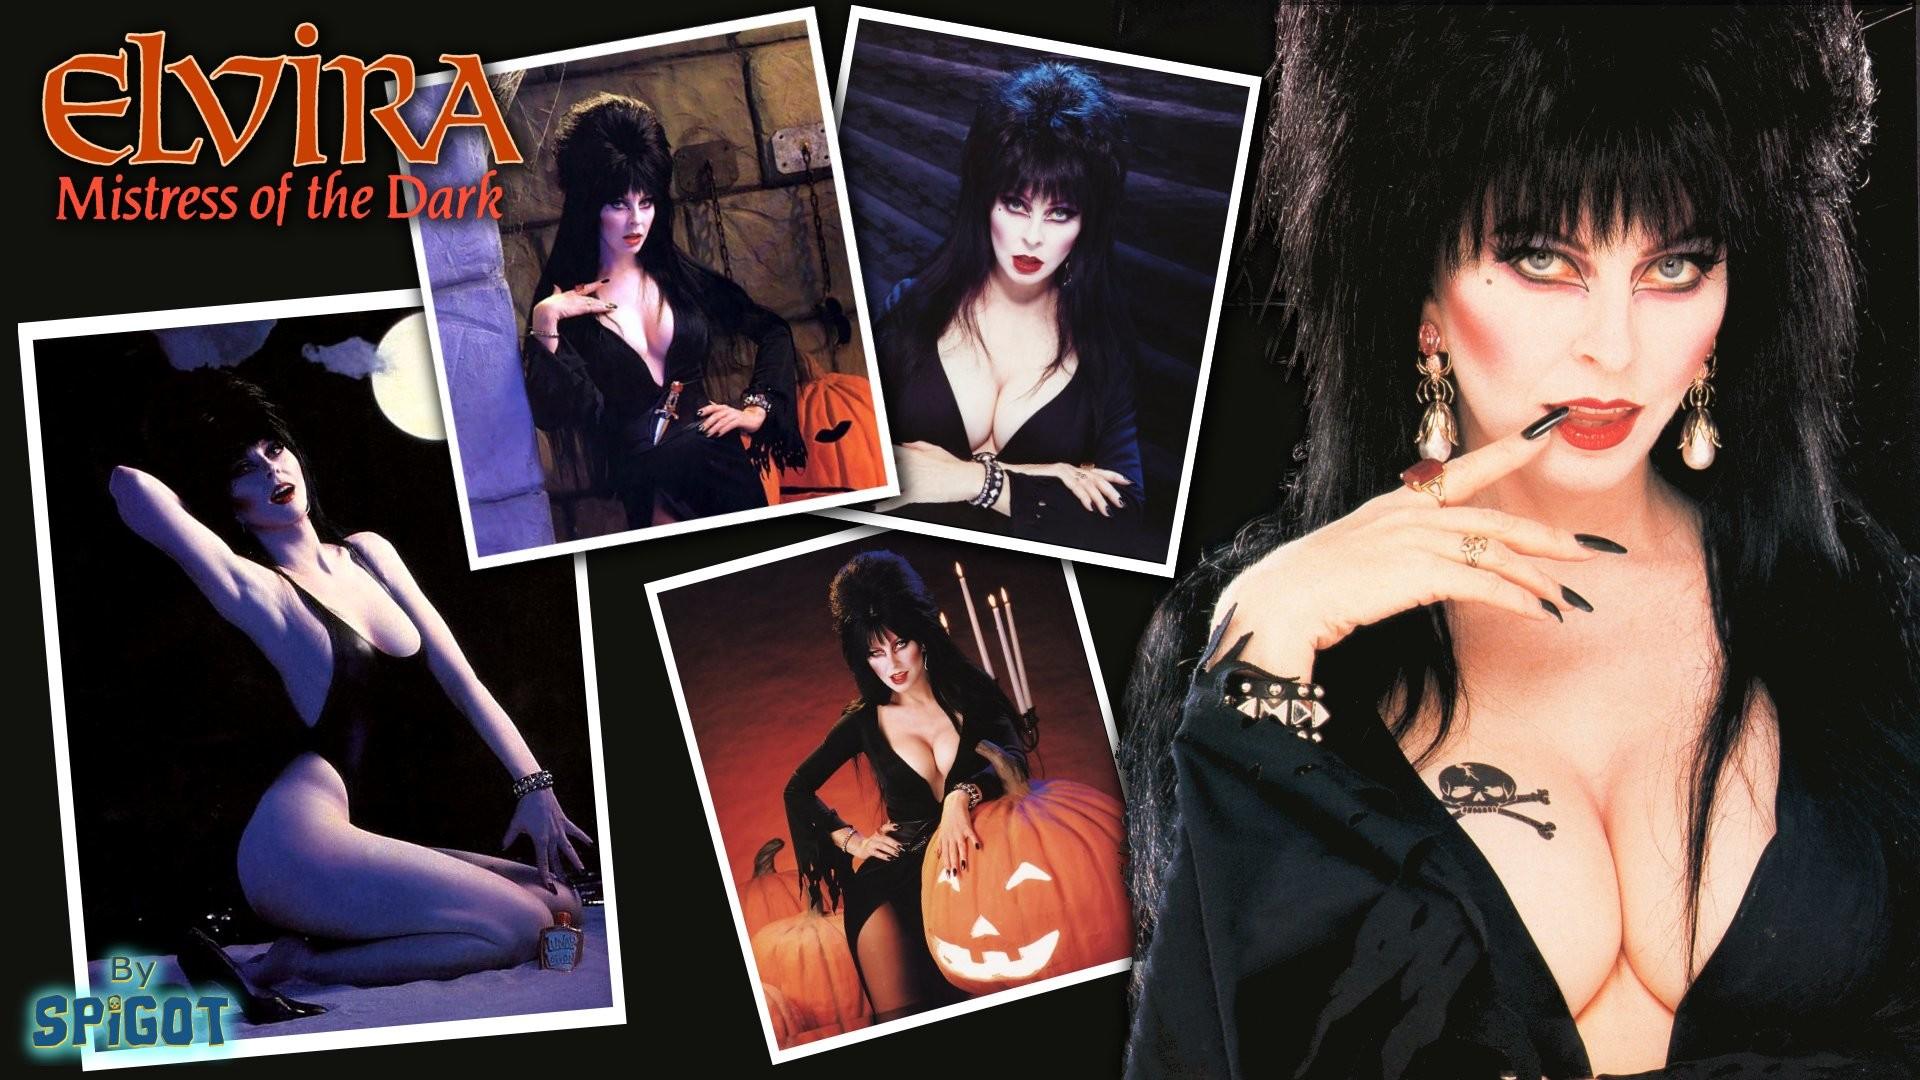 Download Elvira: Mistress of the Dark wallpaper (1920×1080)